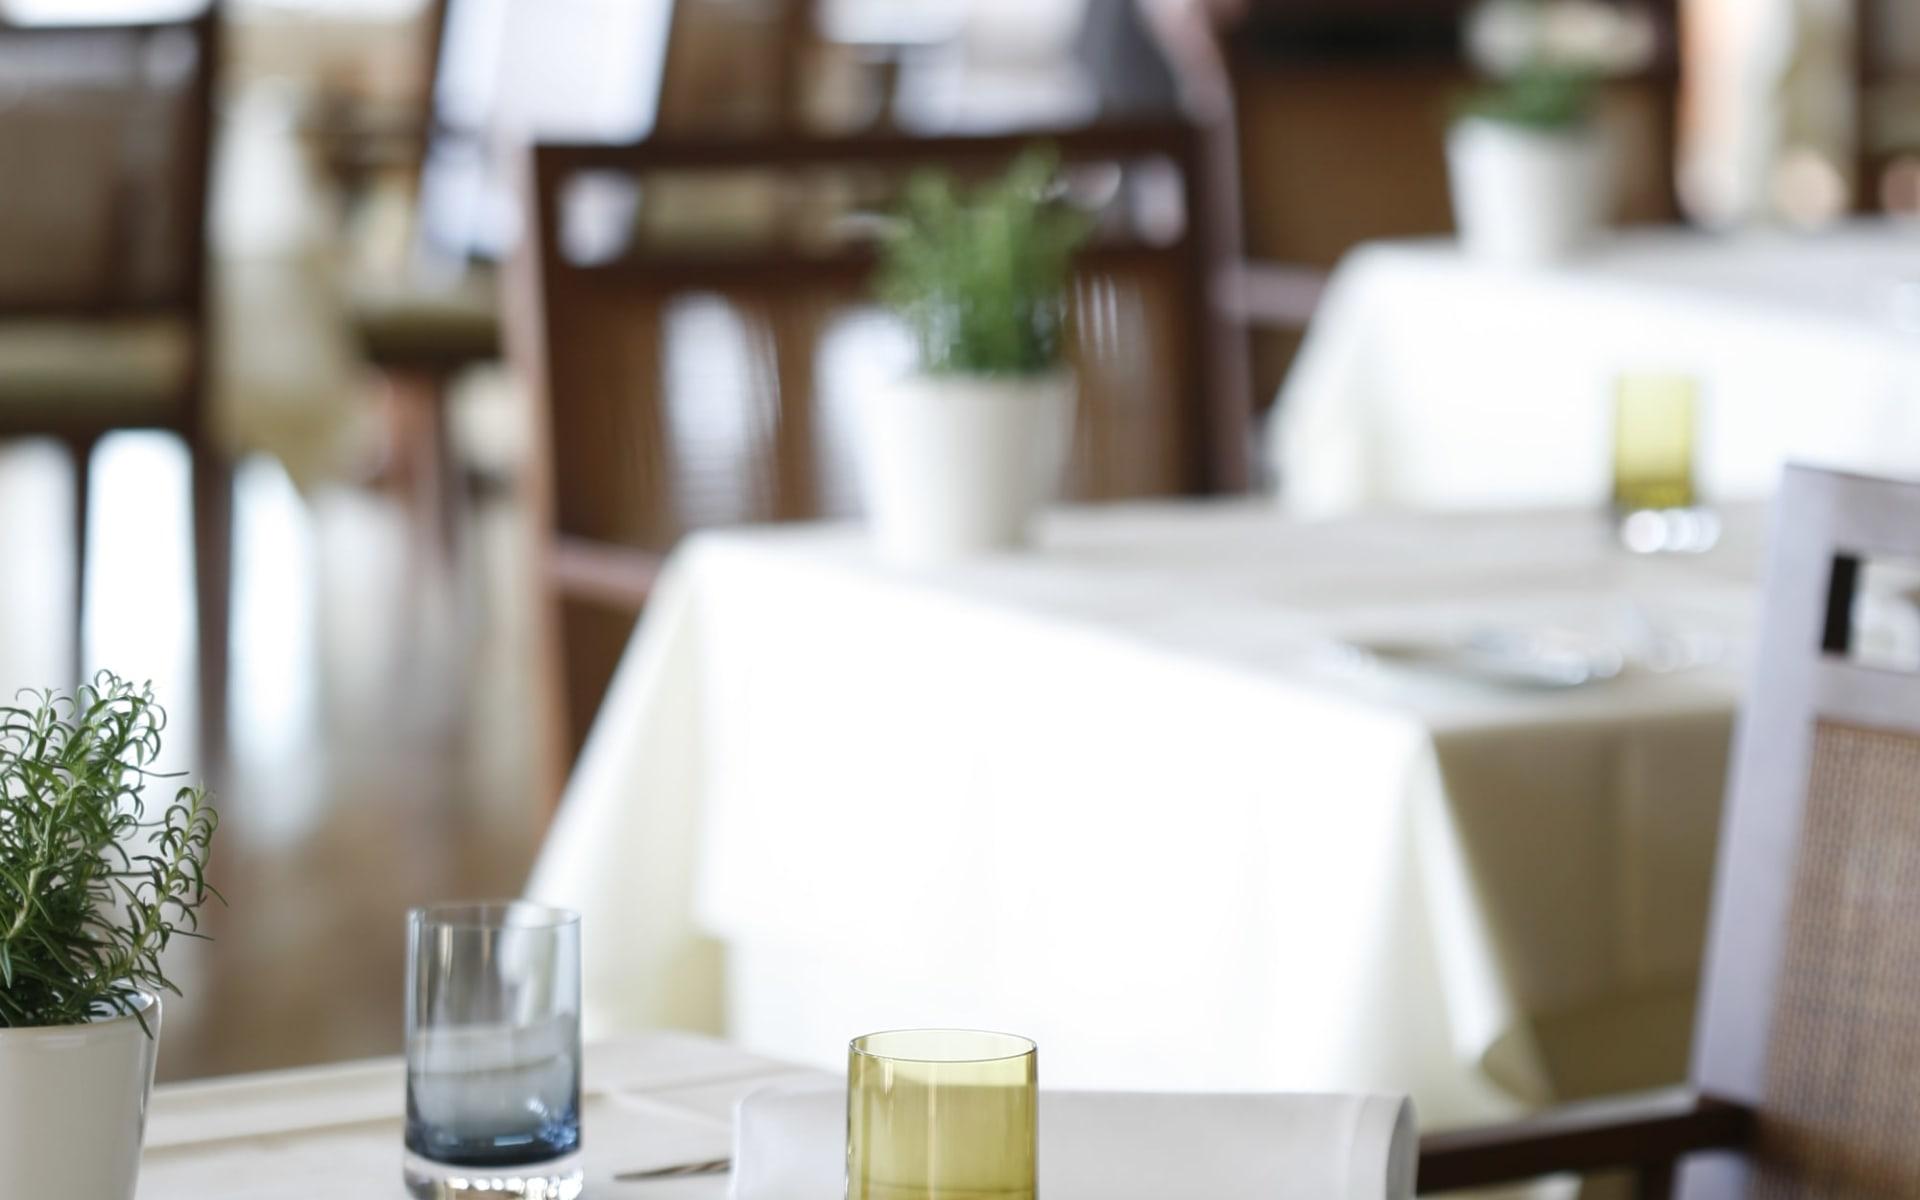 Cascade Wellness & Lifestyle Resort in Lagos: Cascade Wellness & Lifestyle Resort - Restaurant Senses